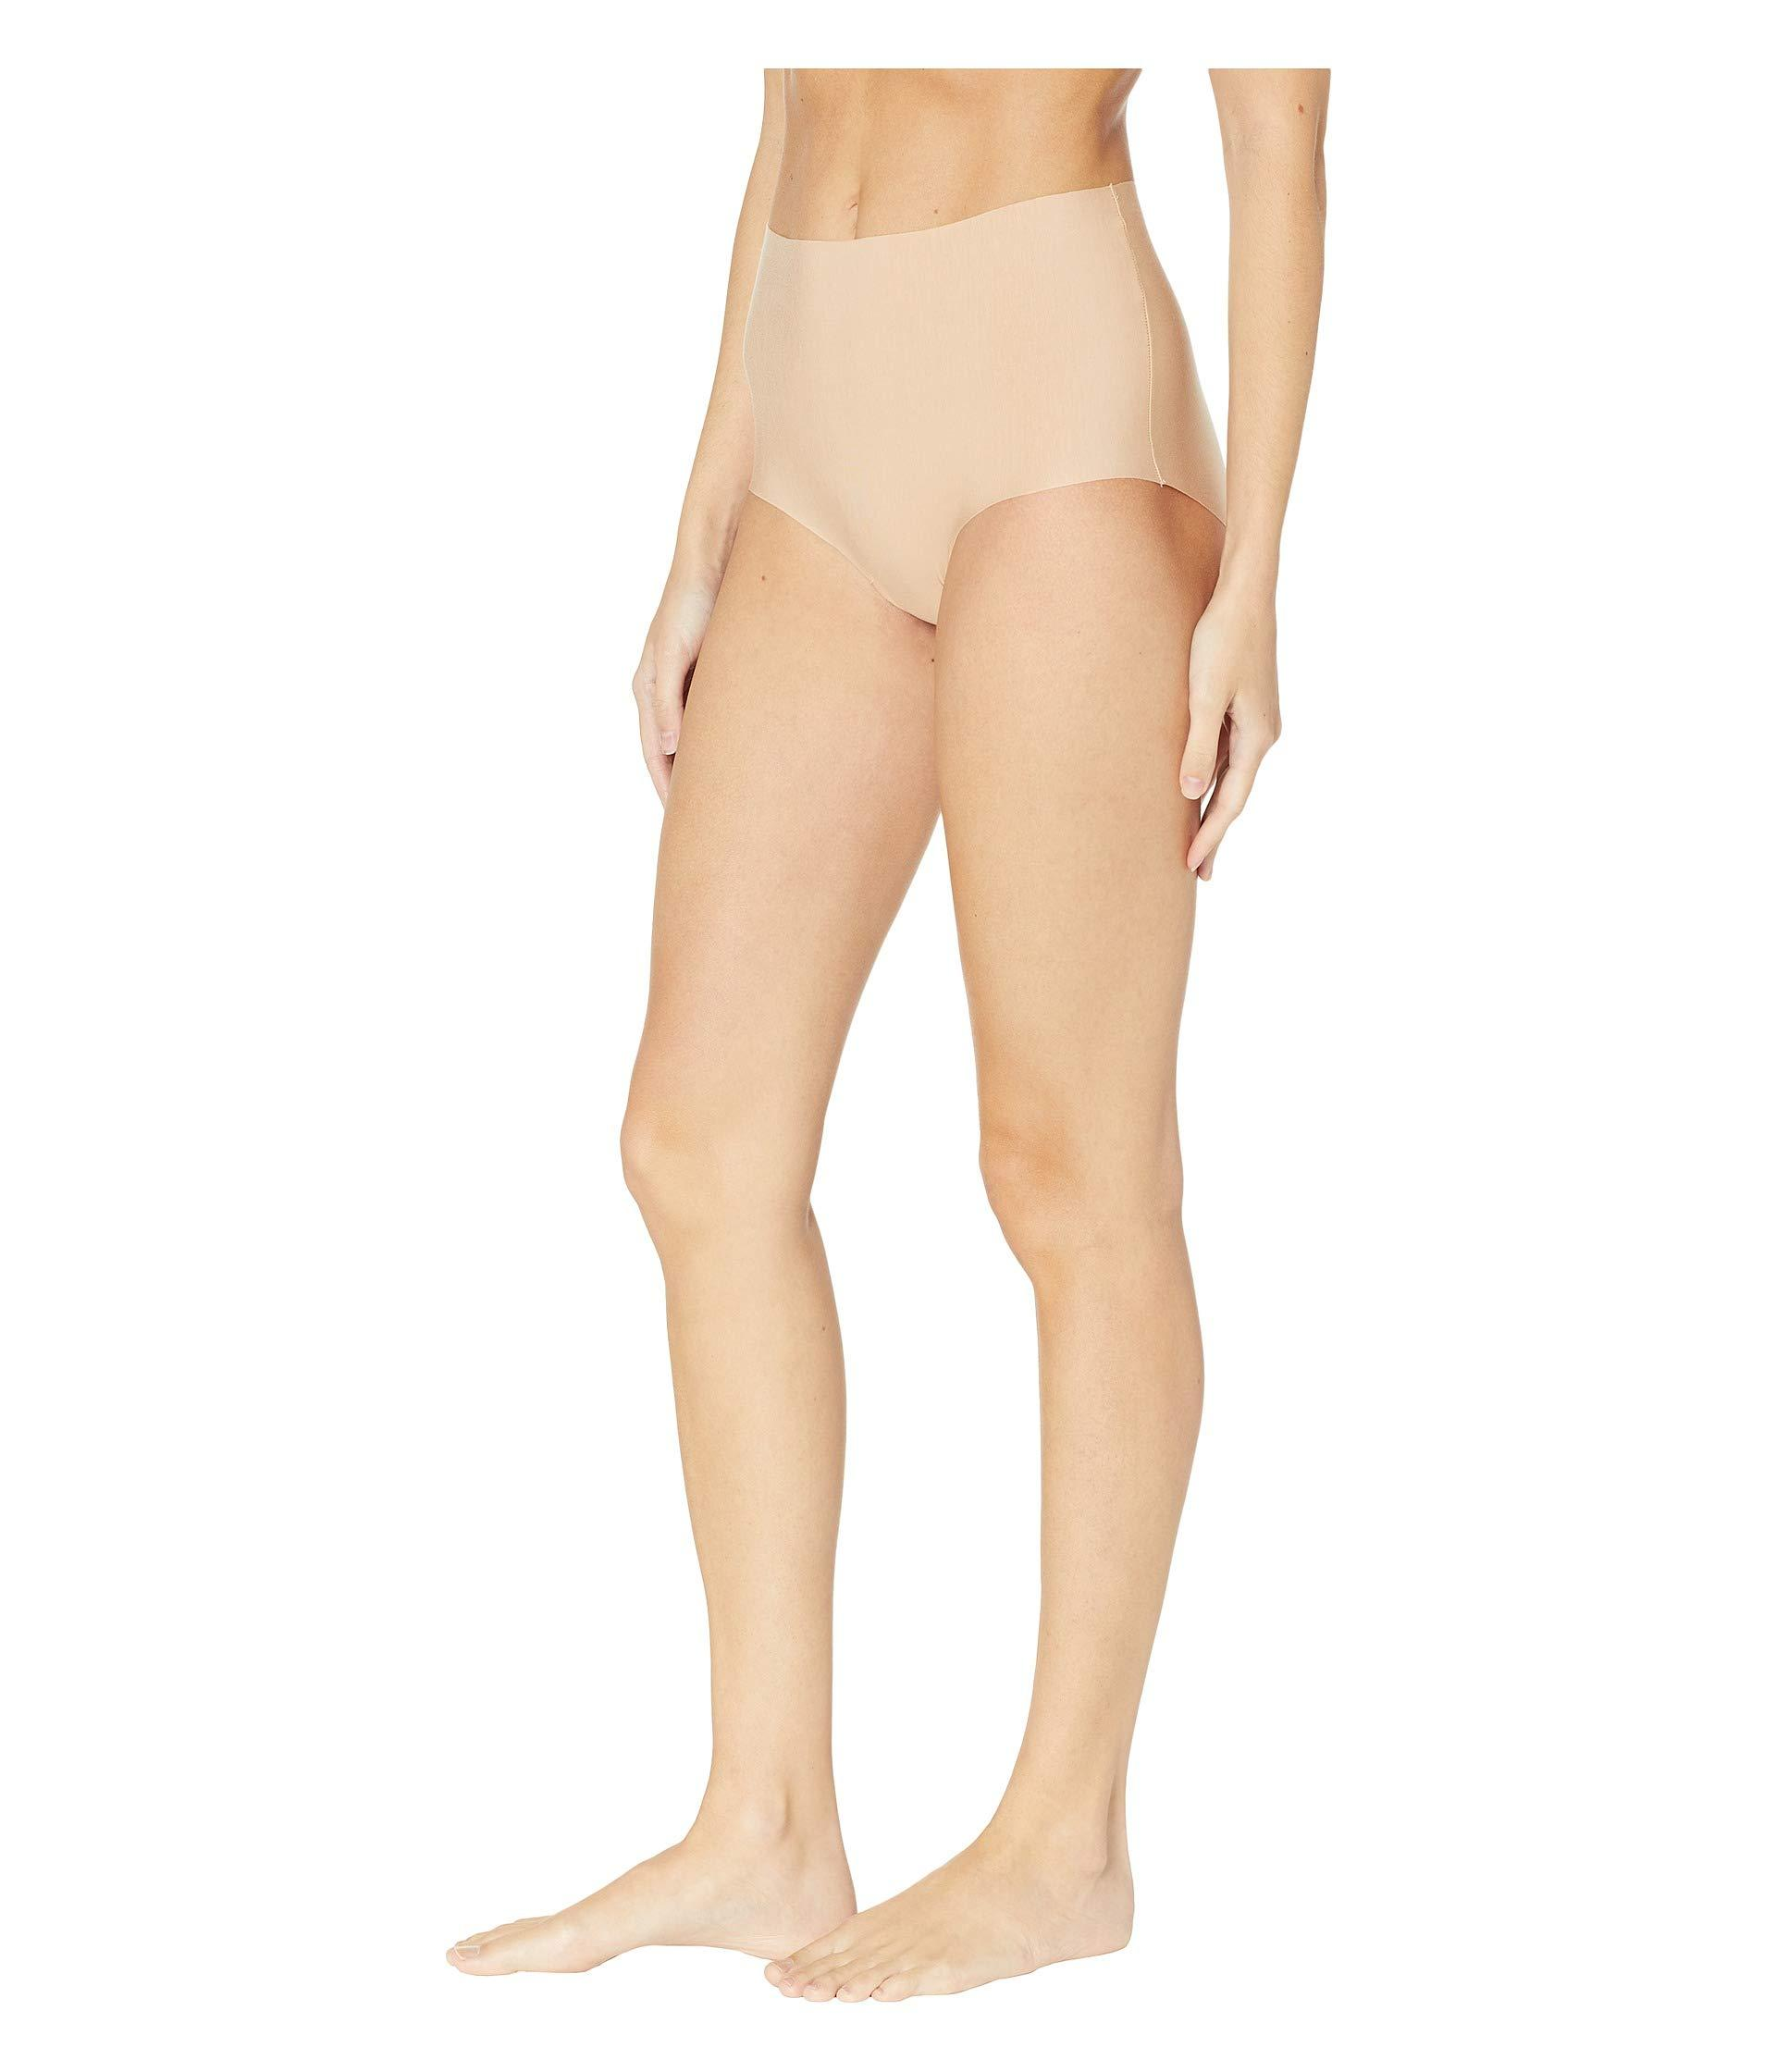 1369583df596 Lyst - Commando Butter High-rise Panty Hrp04 (beige) Women's Underwear in  Natural